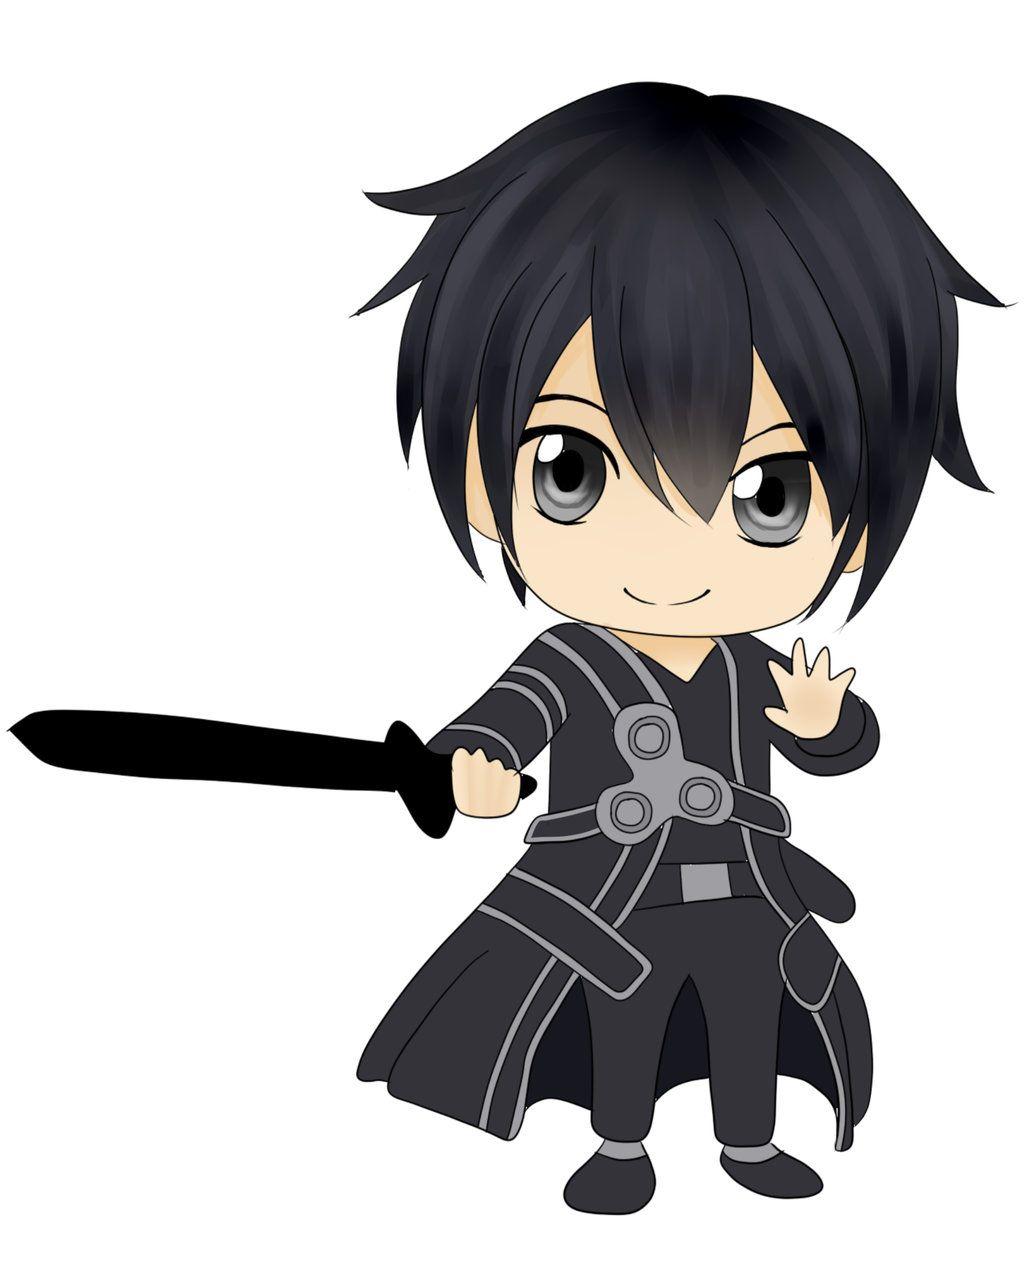 1024x1280 sword art online kirito sao sword art online kirito, sword art